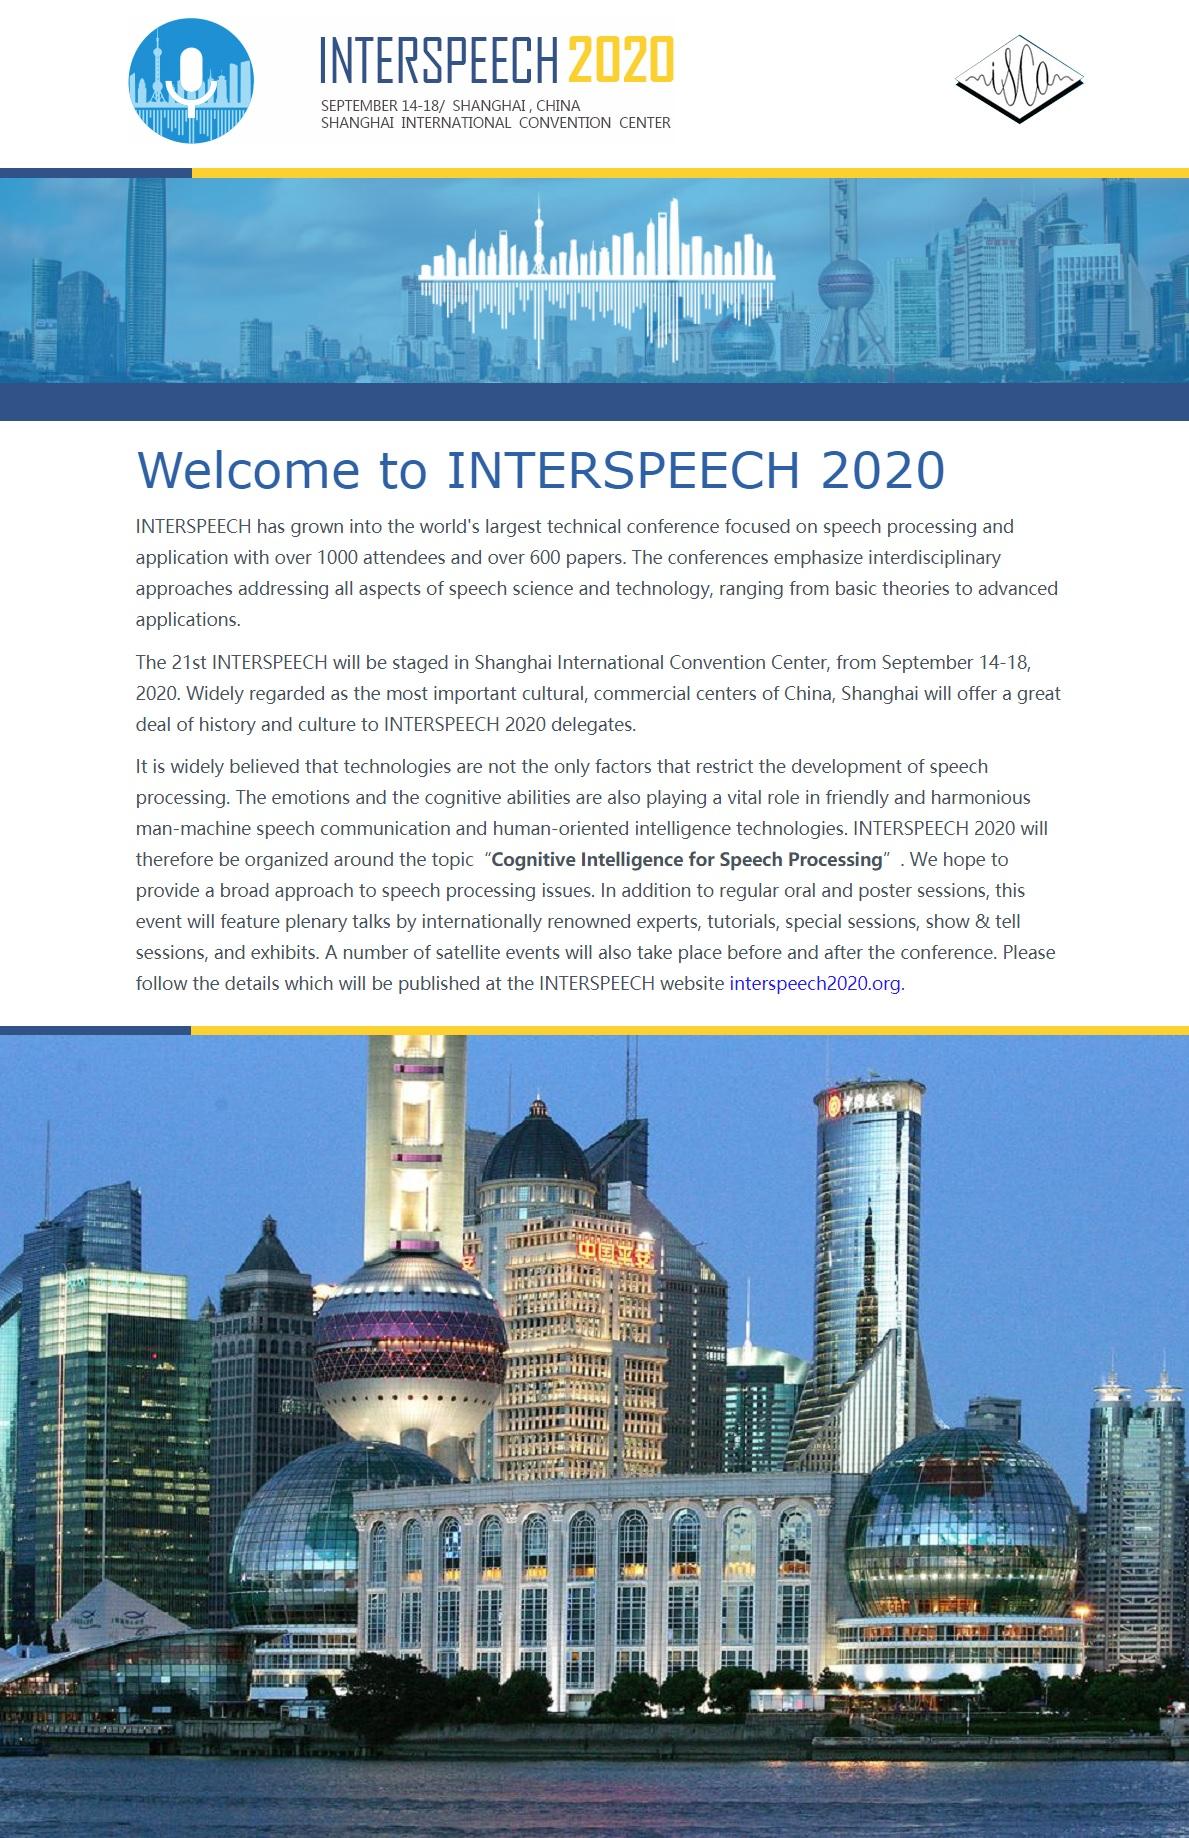 INTERSPEECH 2020